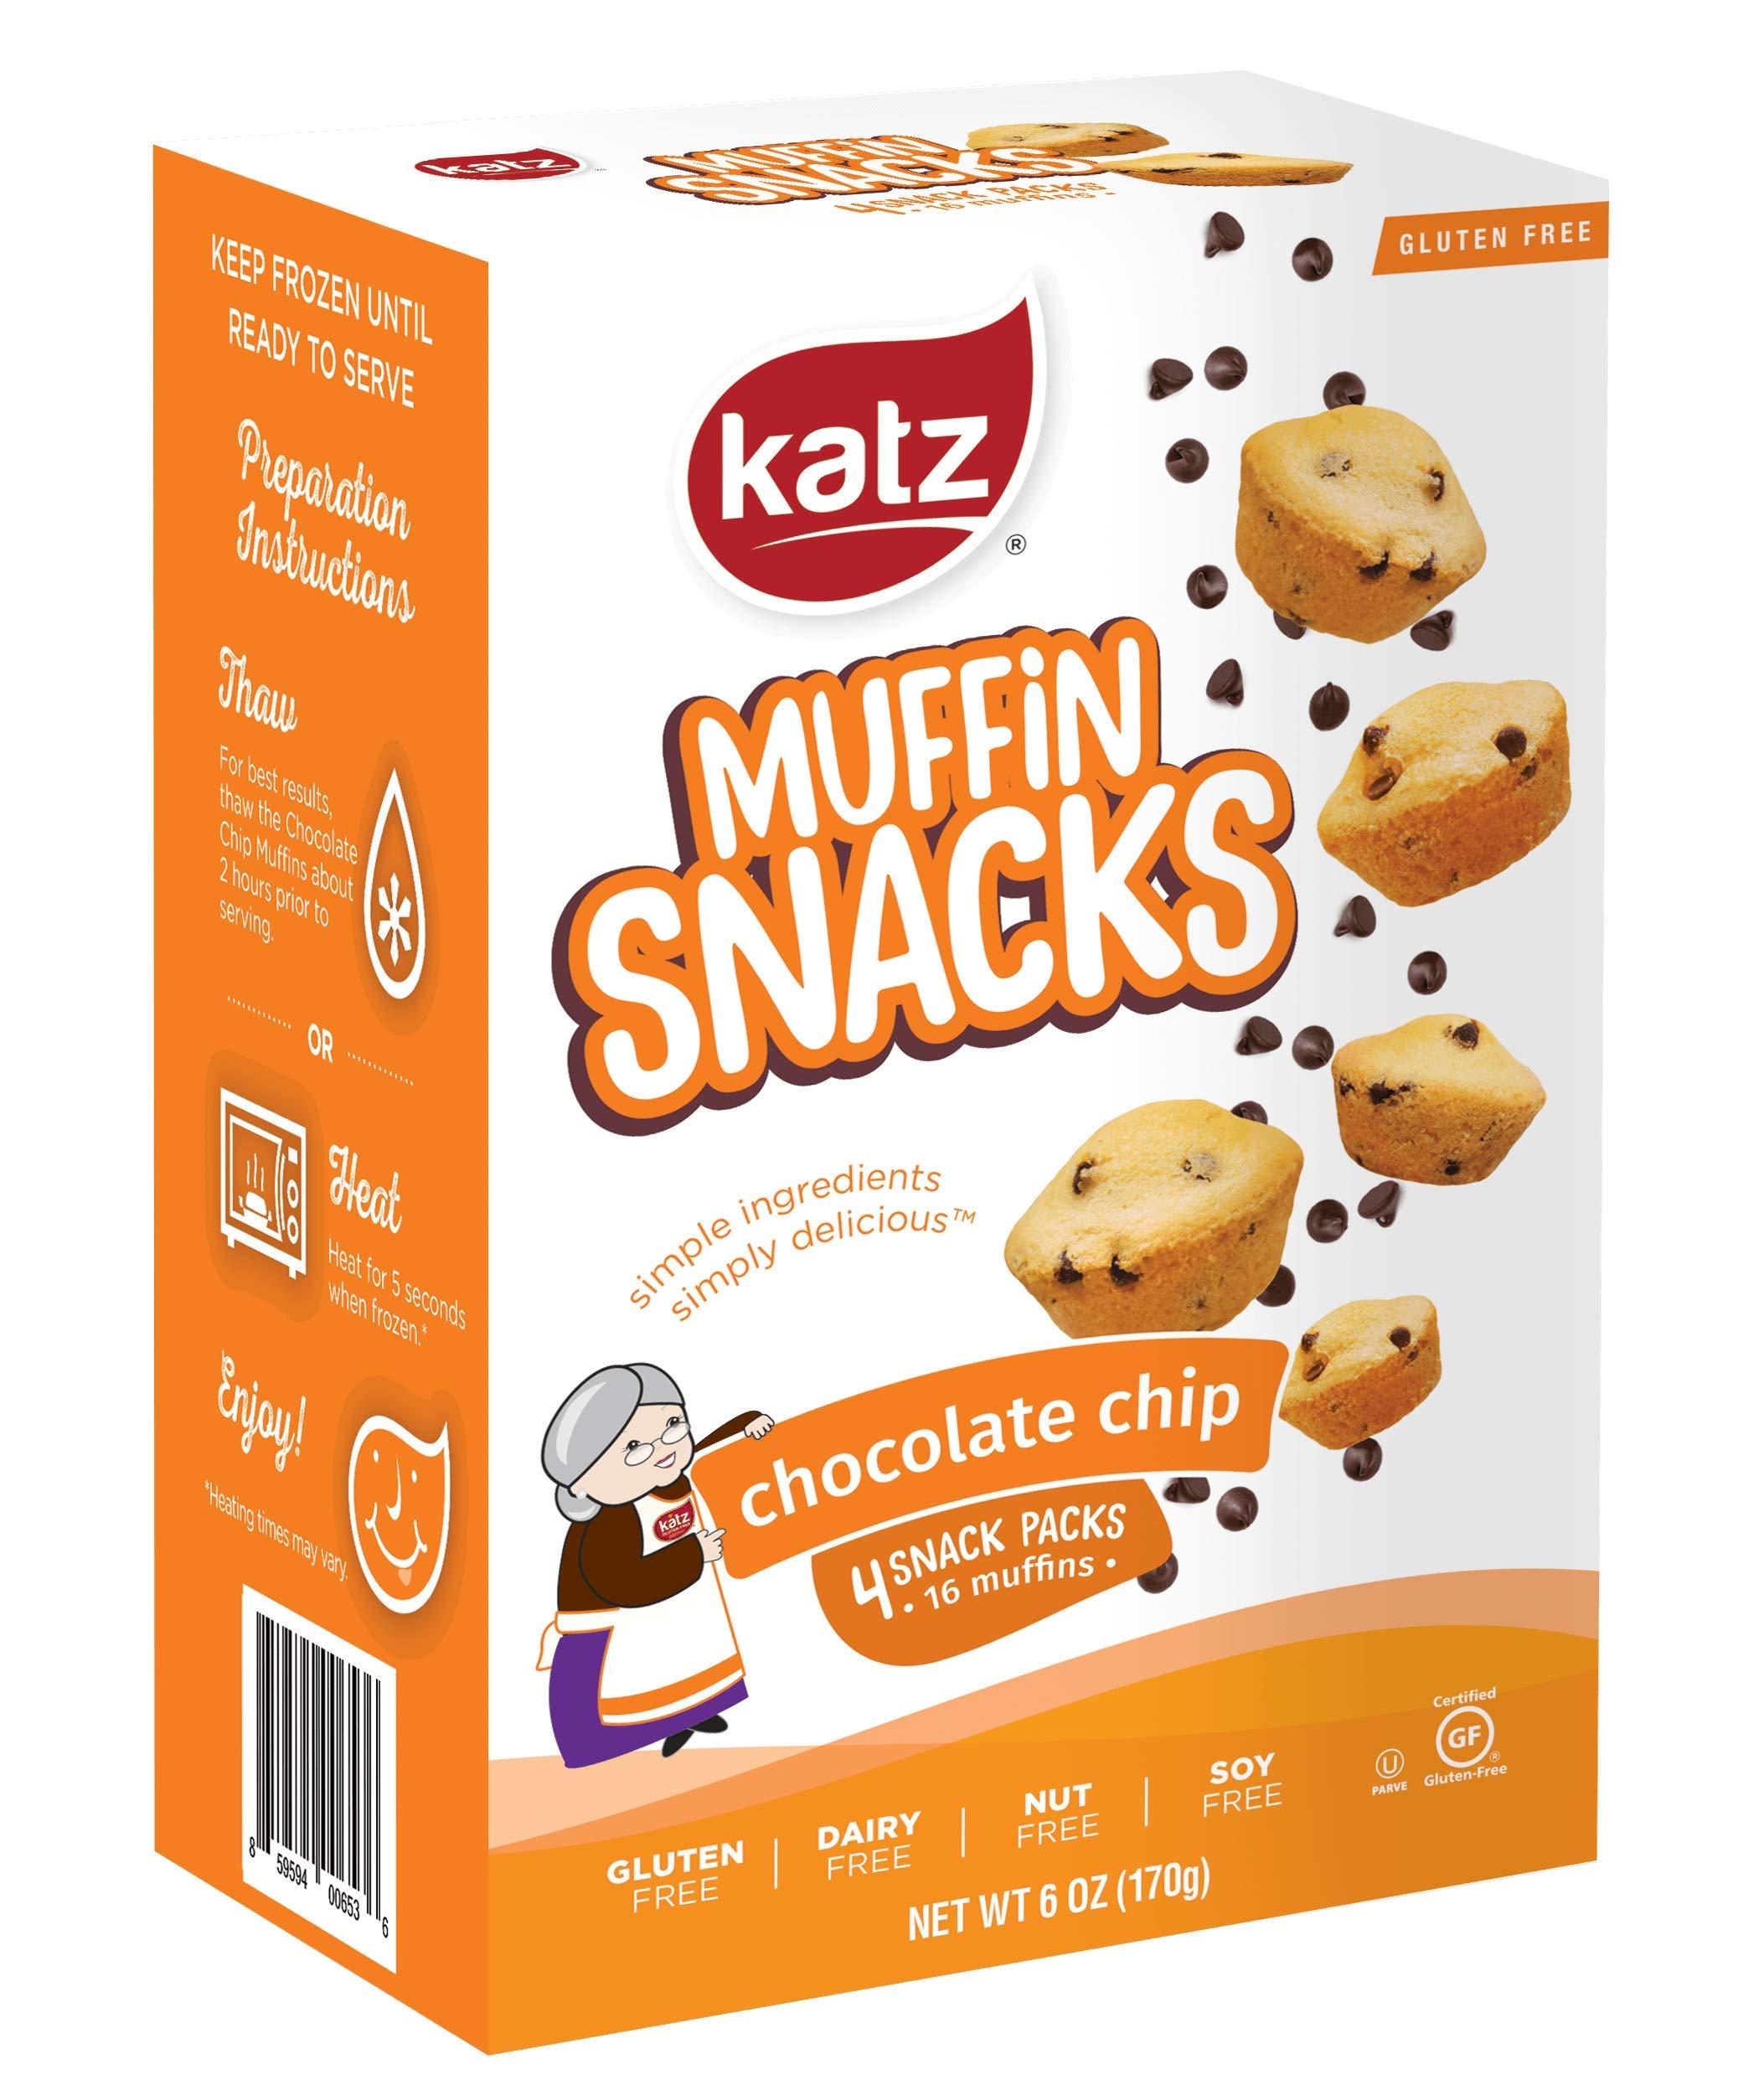 Katz Gluten Free Chocolate Chip Muffin Snacks   Dairy Free, Nut Free, Soy Free, Gluten Free   Kosher (6 Packs, 6 Ounce Each)